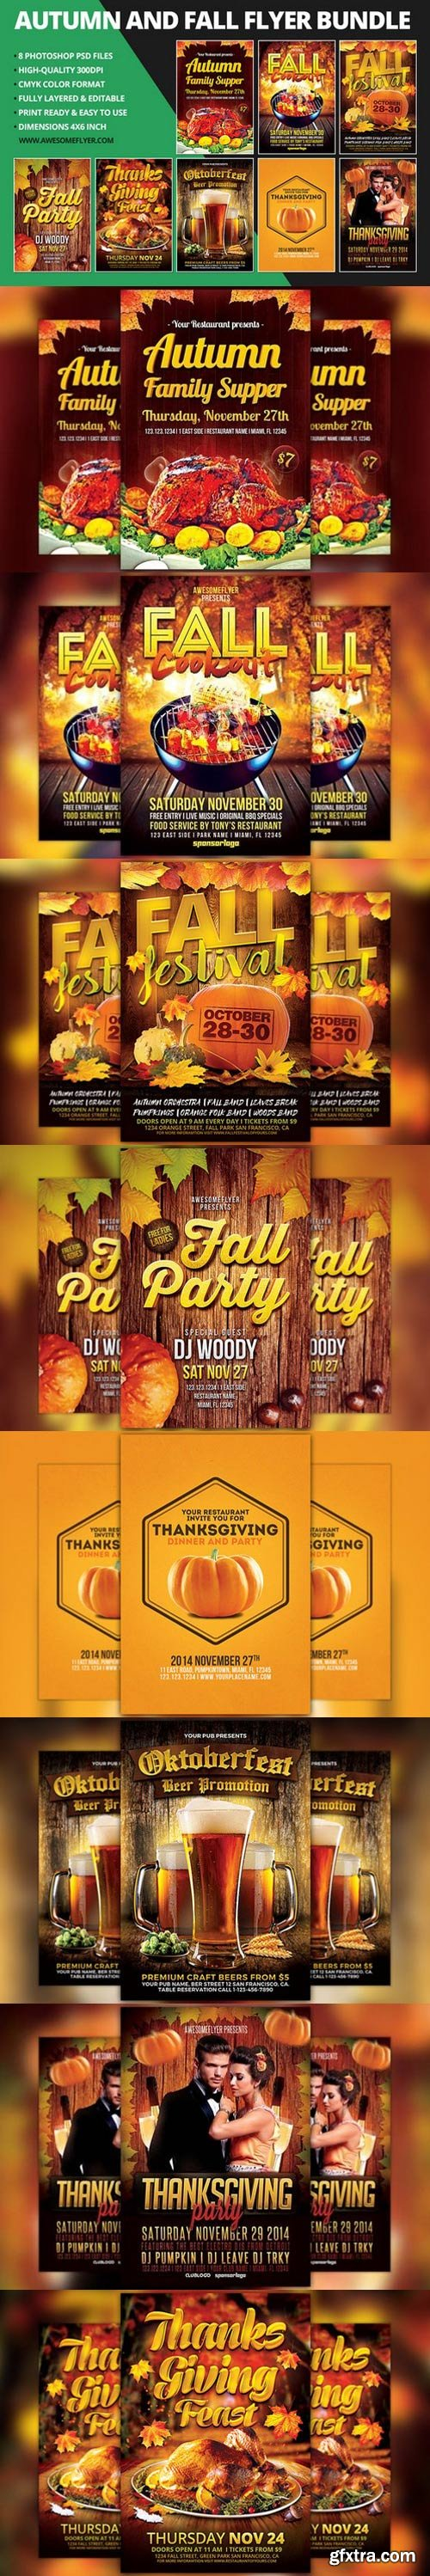 CM - Autumn & Fall Flyer Template Bundle 949413